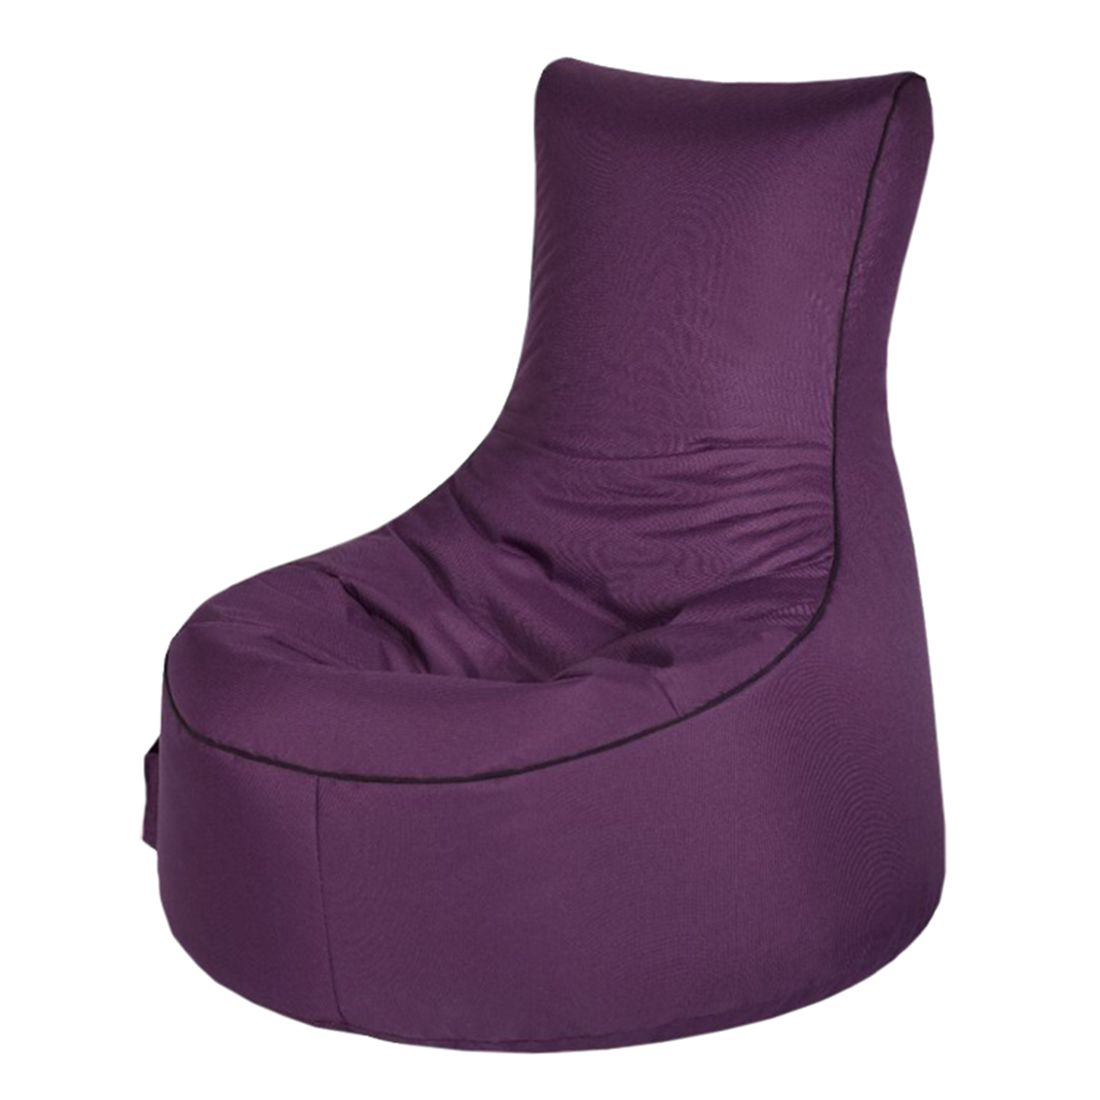 sitzsack scuba swing young aubergine fredriks online kaufen. Black Bedroom Furniture Sets. Home Design Ideas